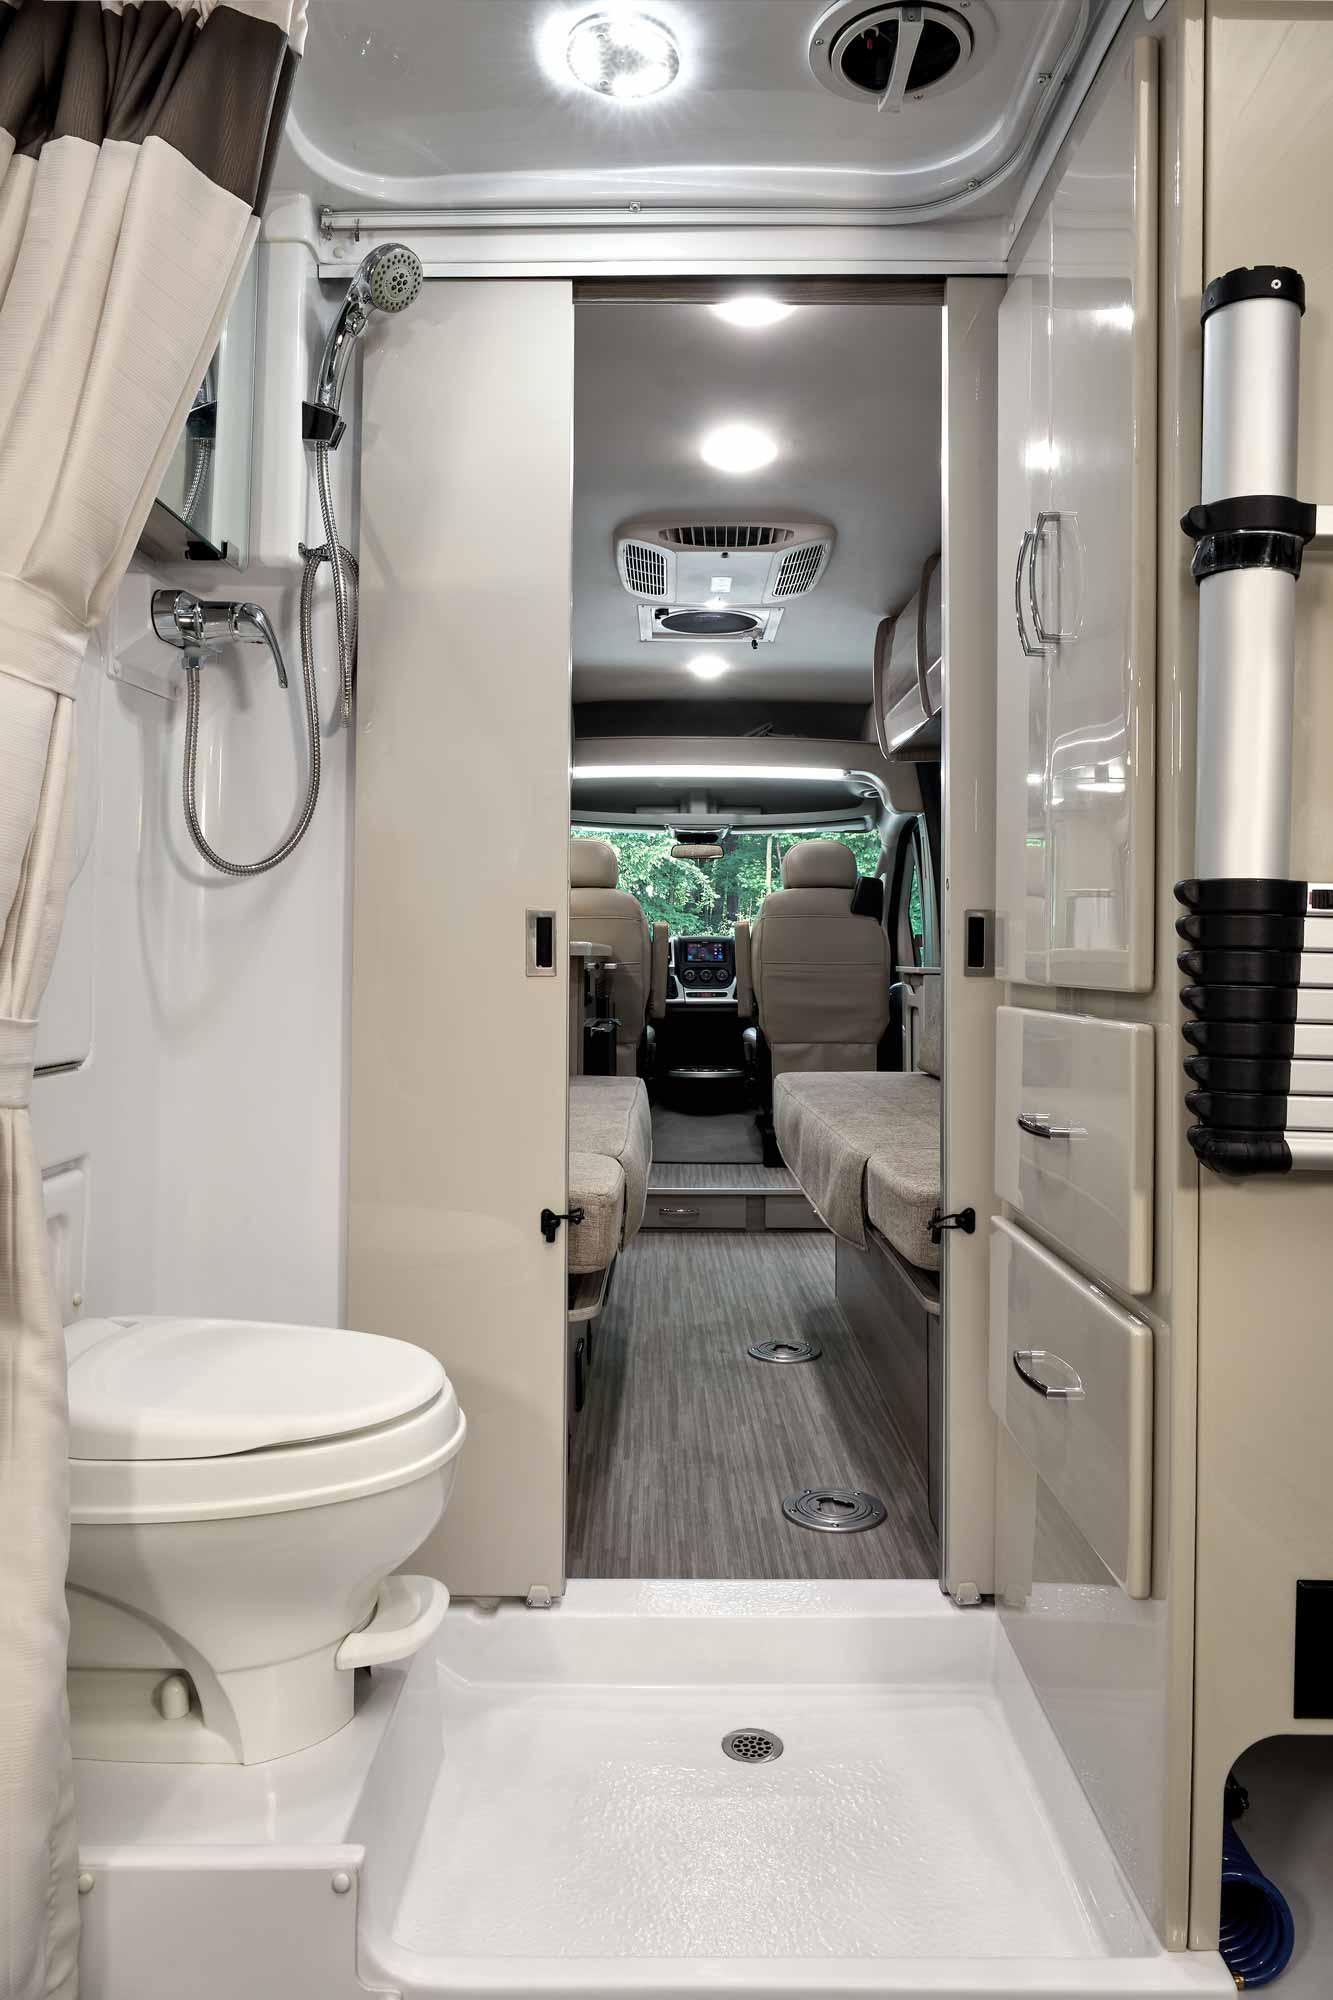 Class B RV Bathroom